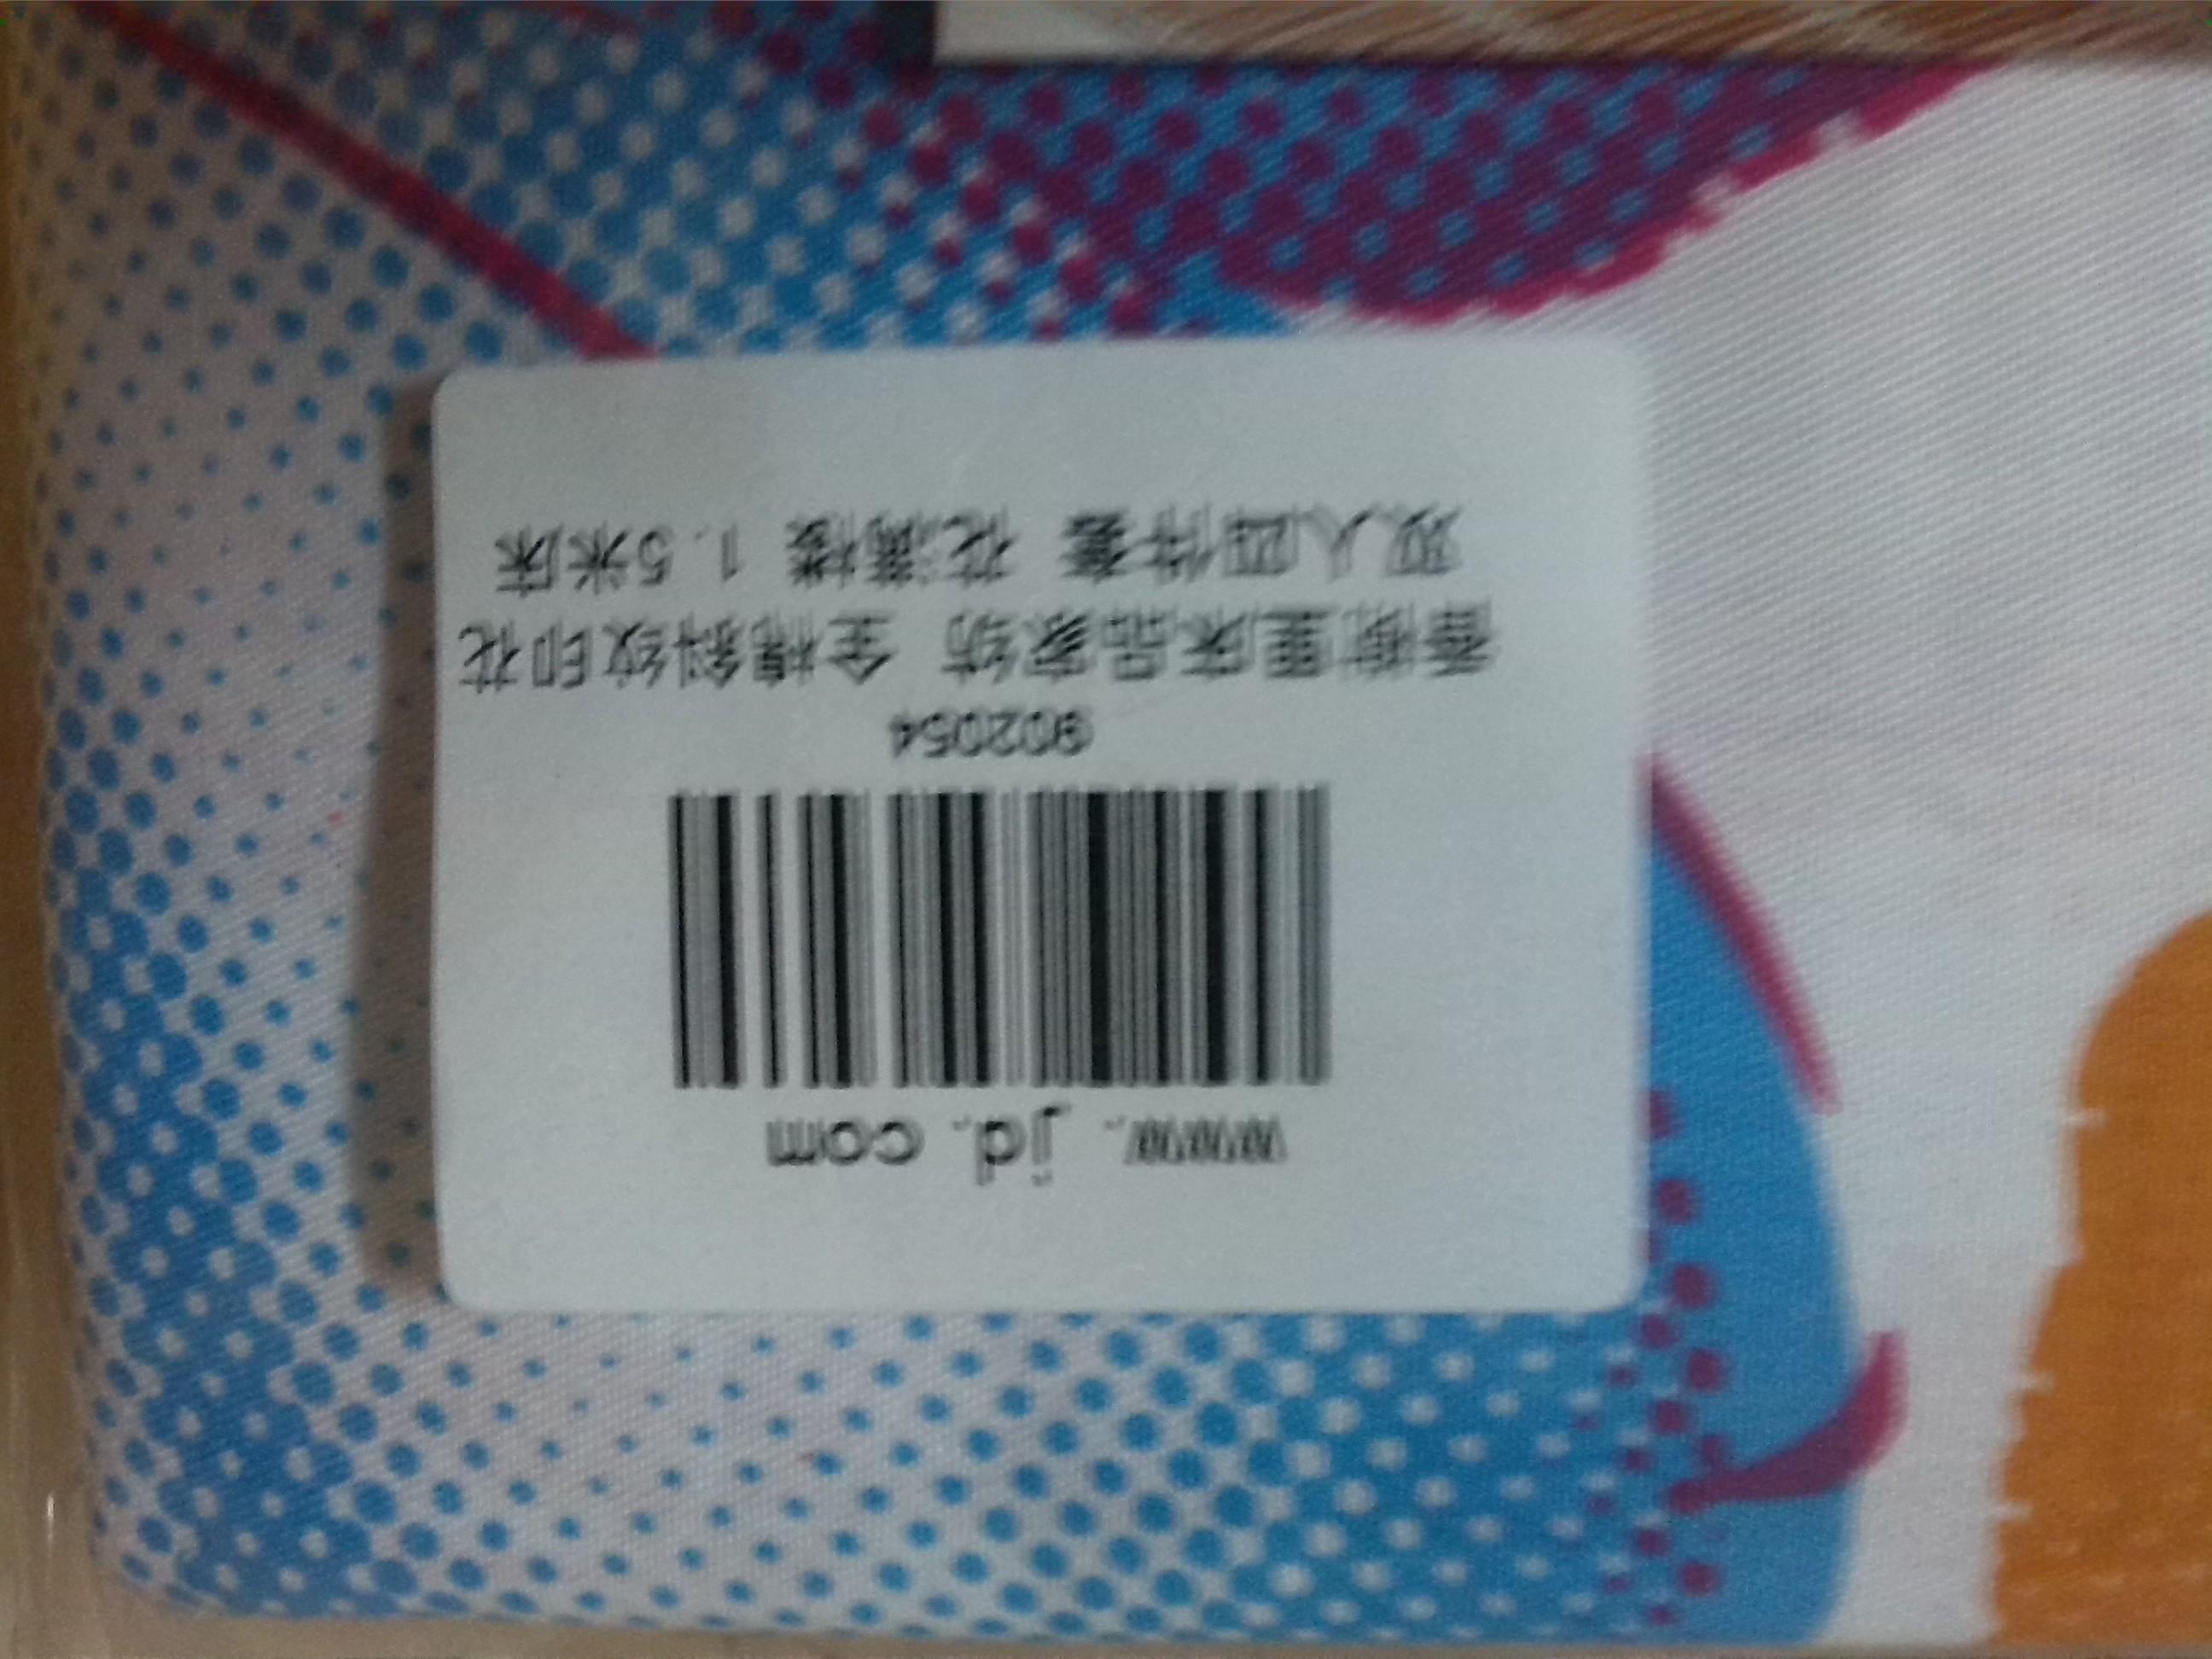 stingray wallets thailand 00243706 mall